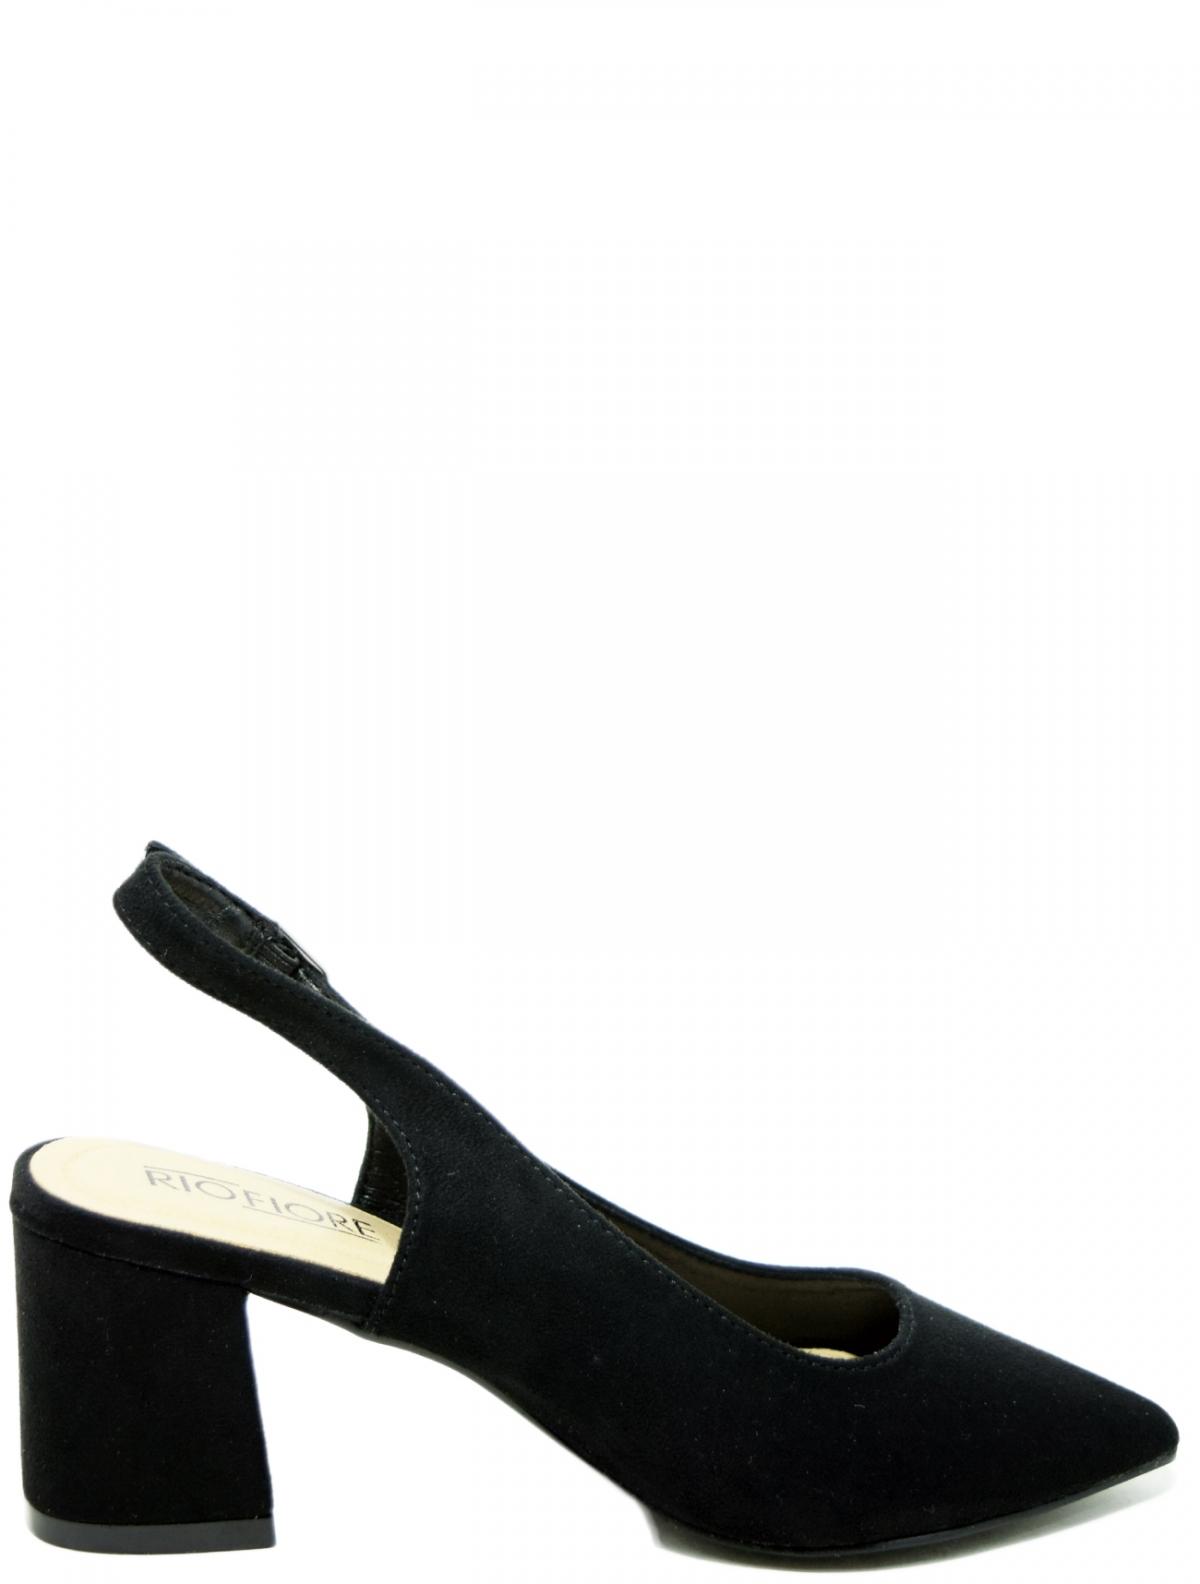 Rio Fiore 565-080-3-4 женские туфли